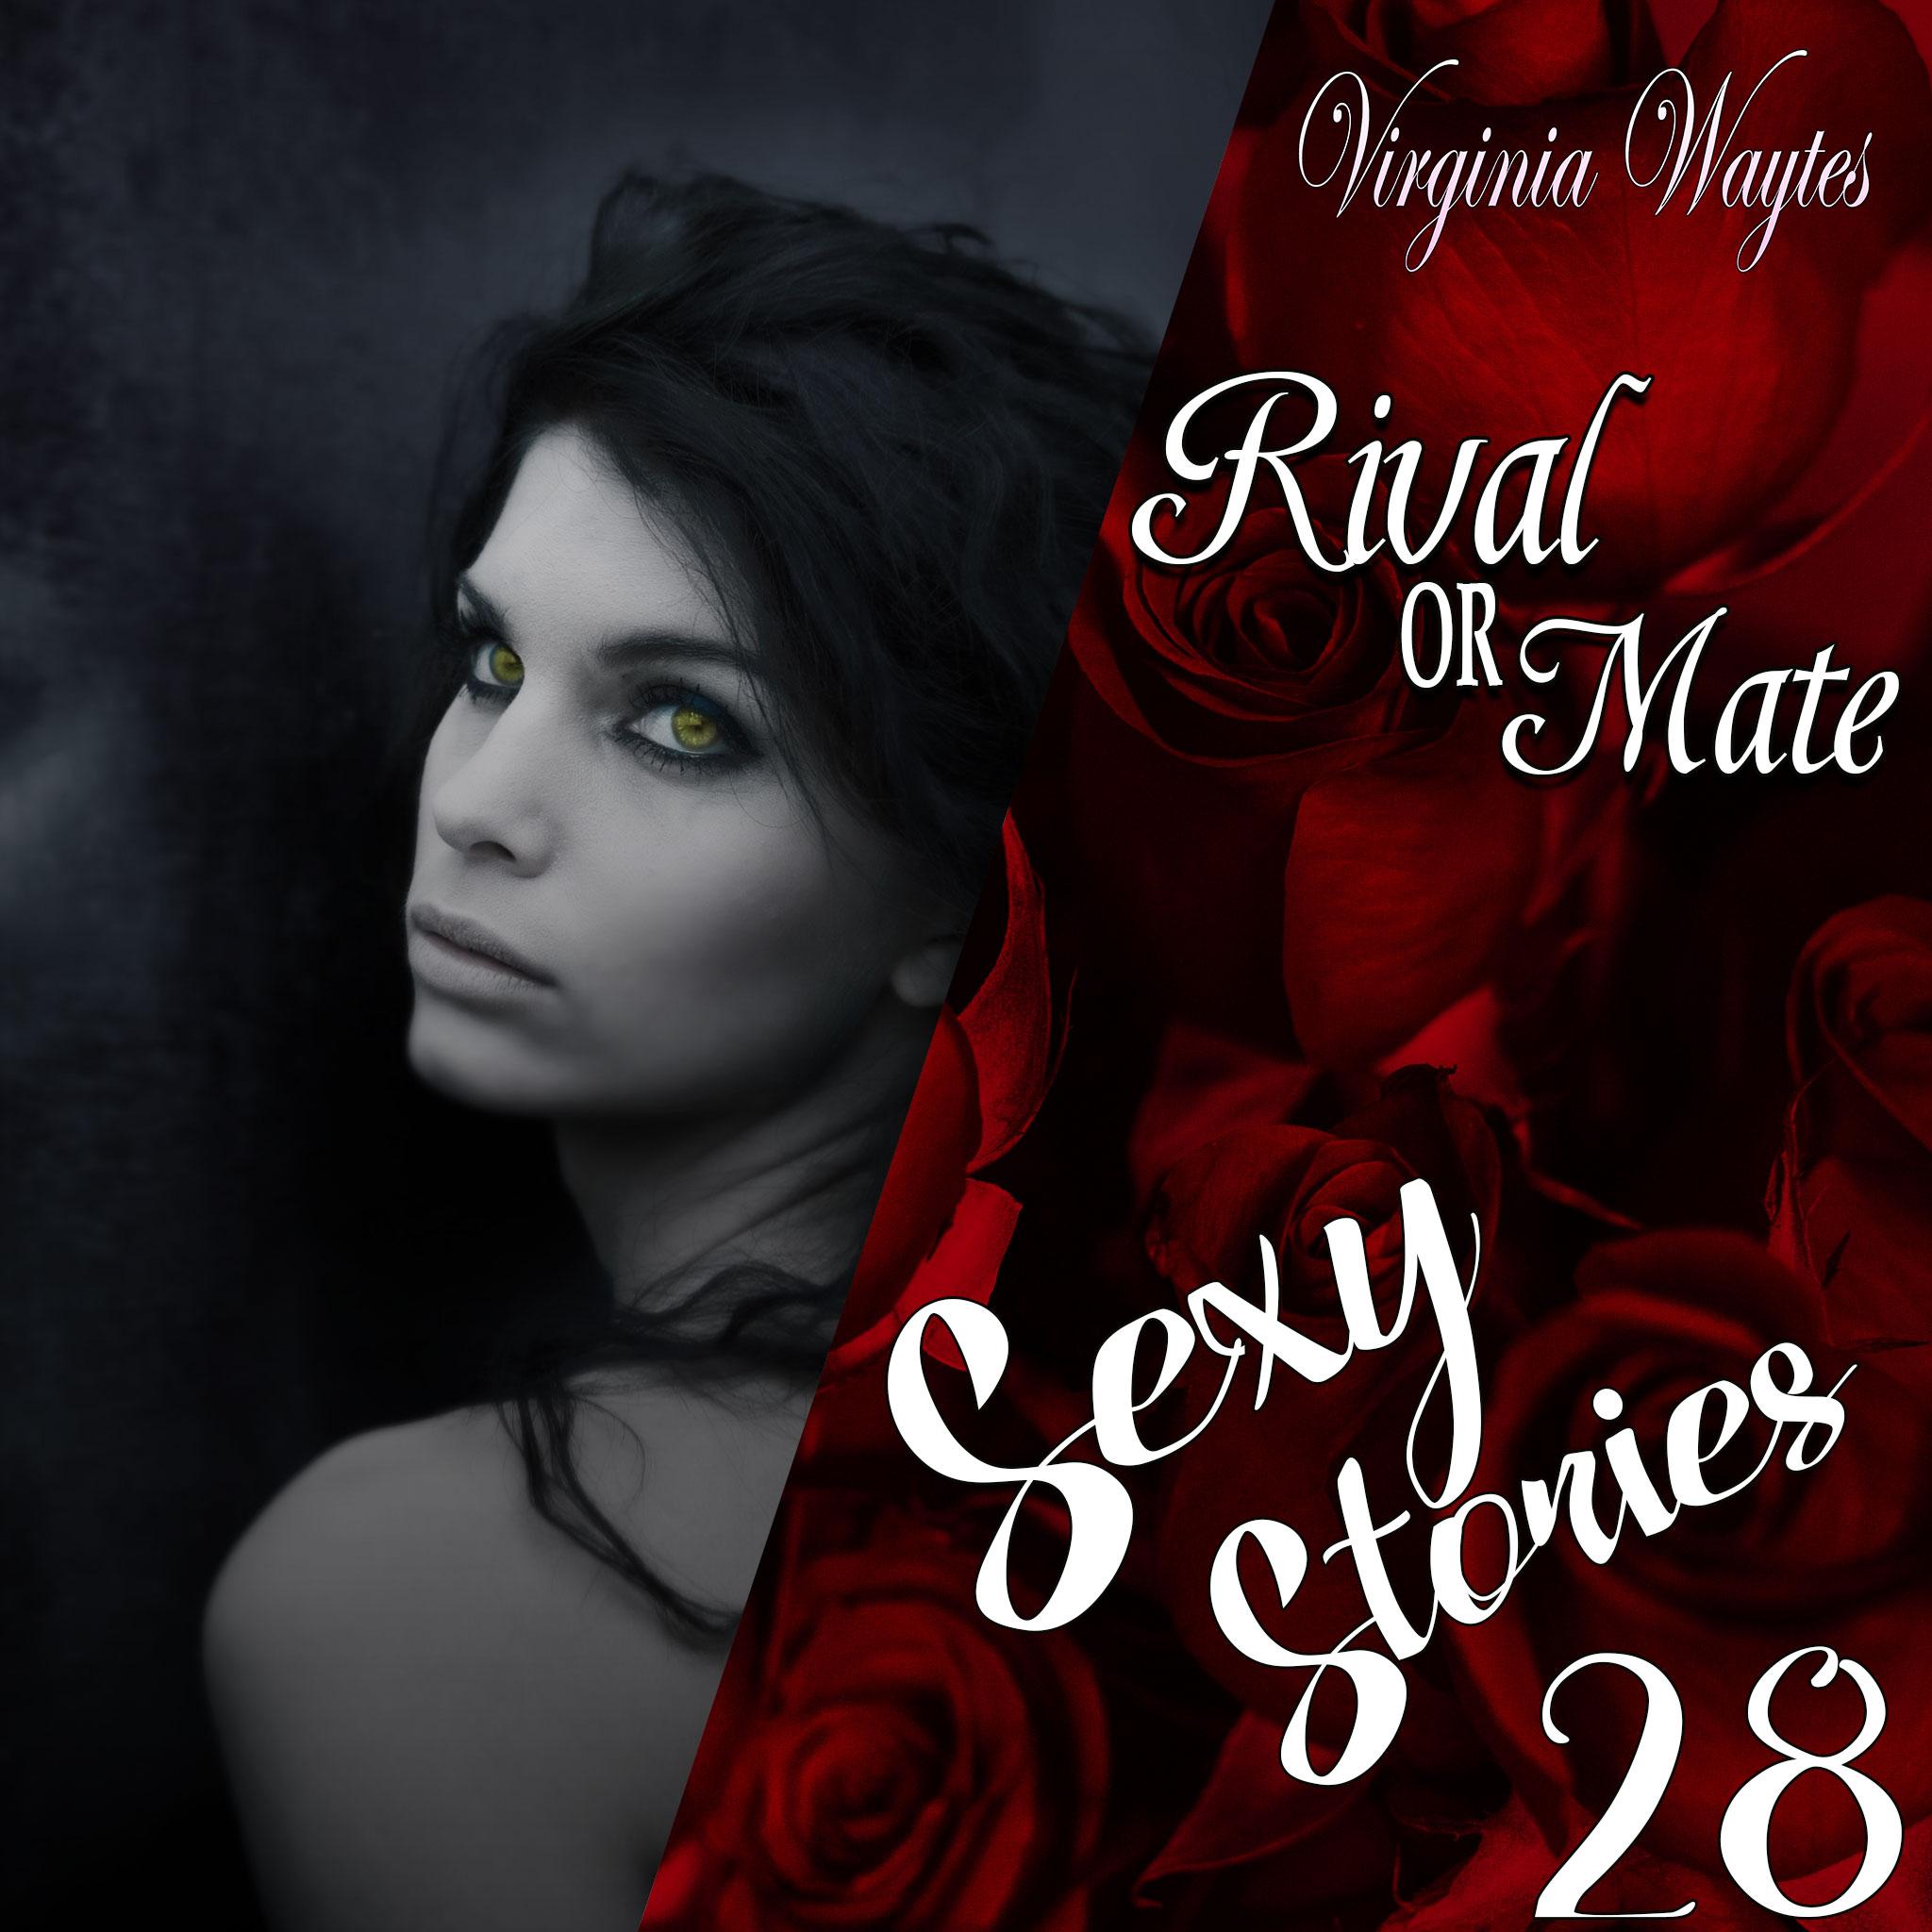 Sexy Stories 28 - Transcript